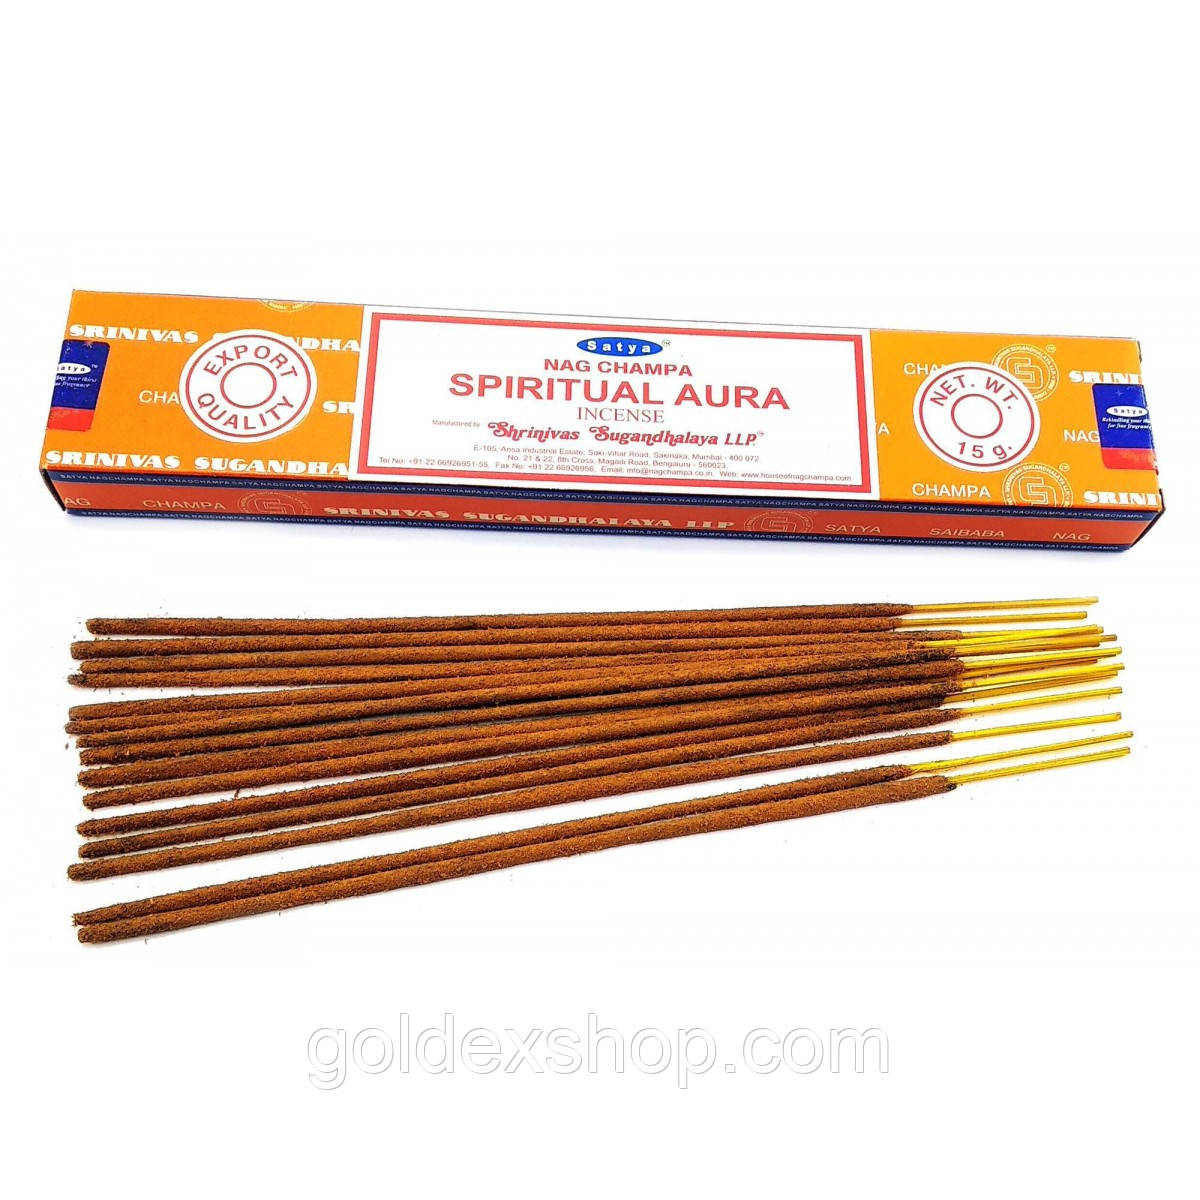 Аромапалочки Spiritual Aura (Духовная Аура)(15 грамм)(Satya) масала благовоние